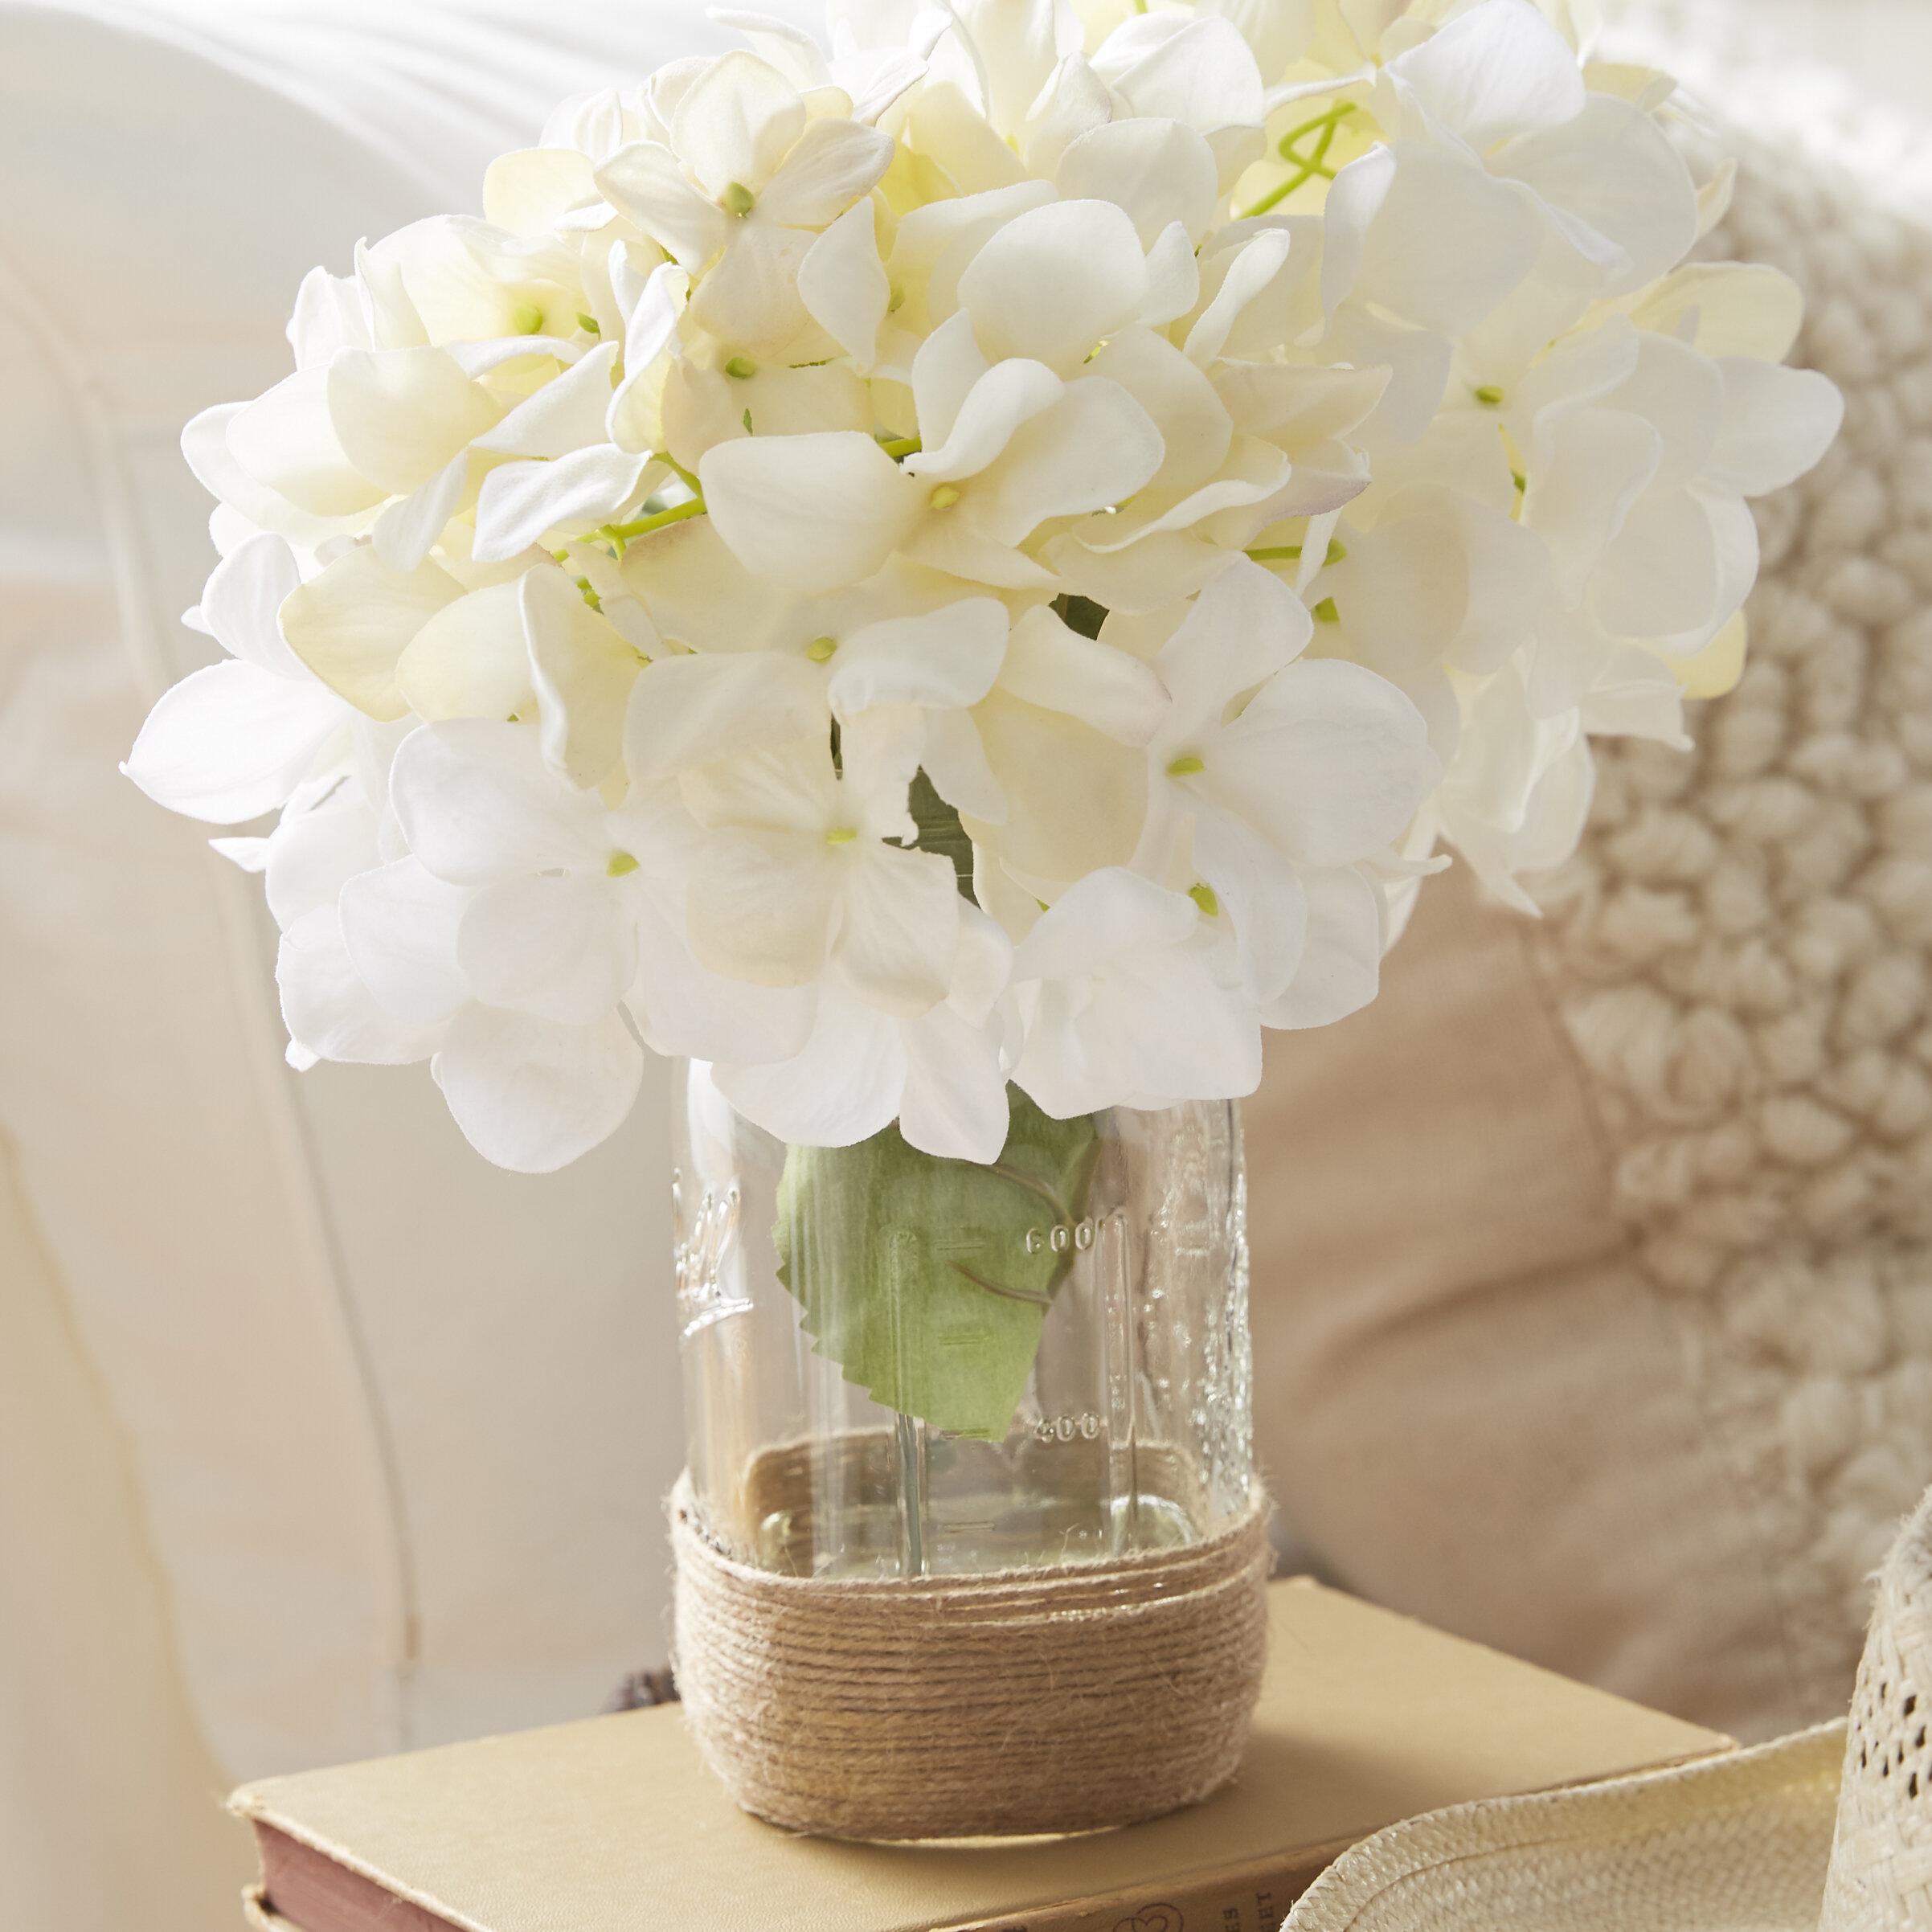 Beachcrest Home Sugarmill Silk Hydrangea Bouquet In Rope Embellished